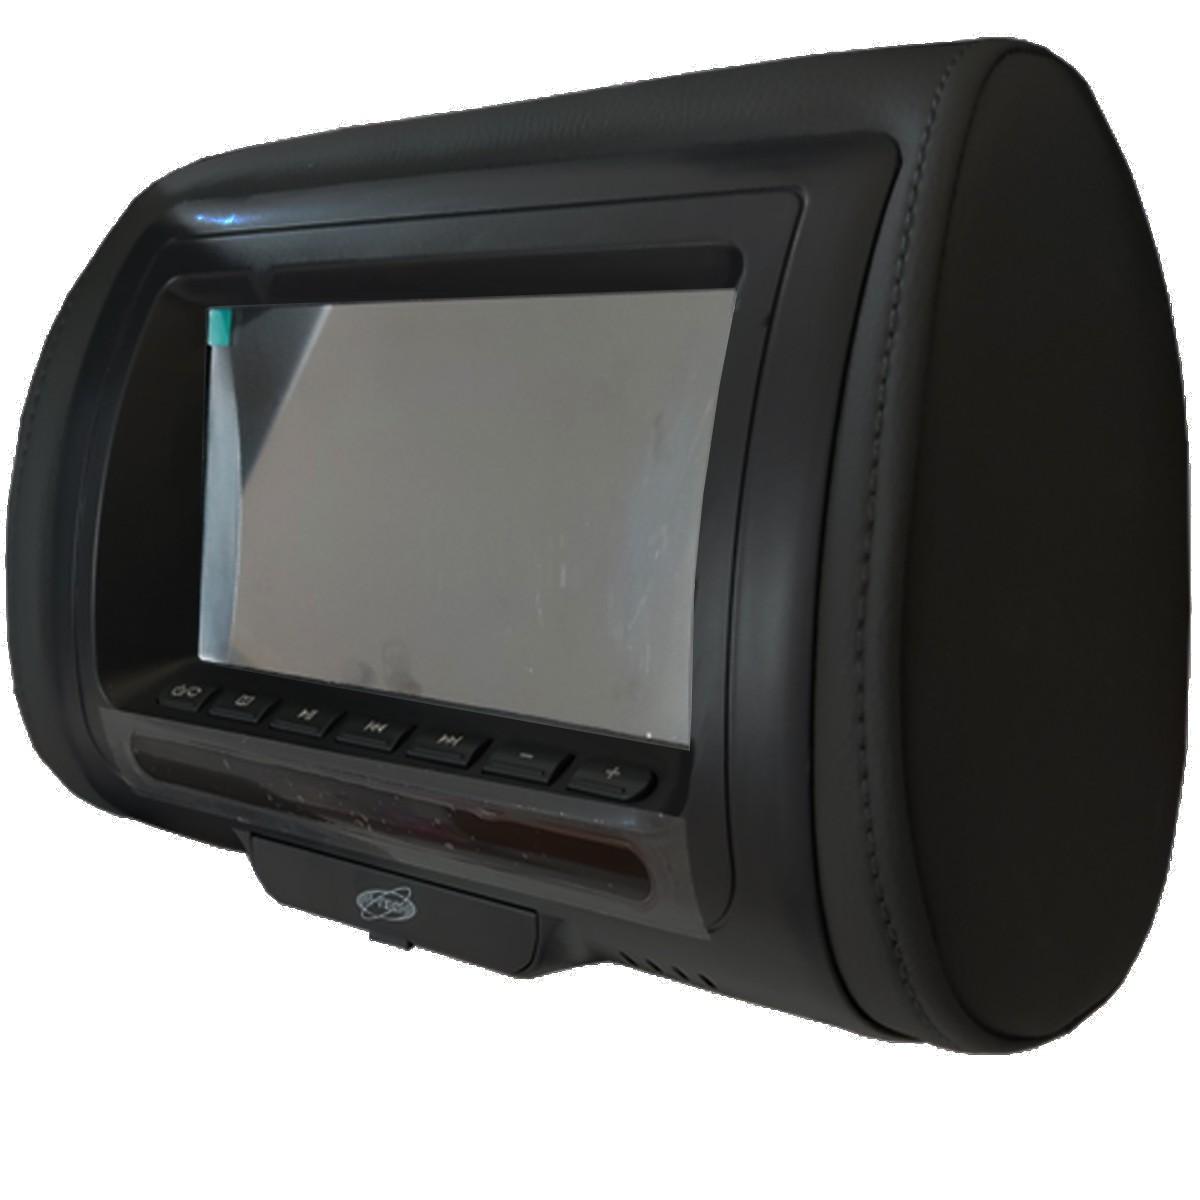 Encosto de Cabeça 7 Polegadas LCD USB SD Card MP3 MP4 H-Tech Preto